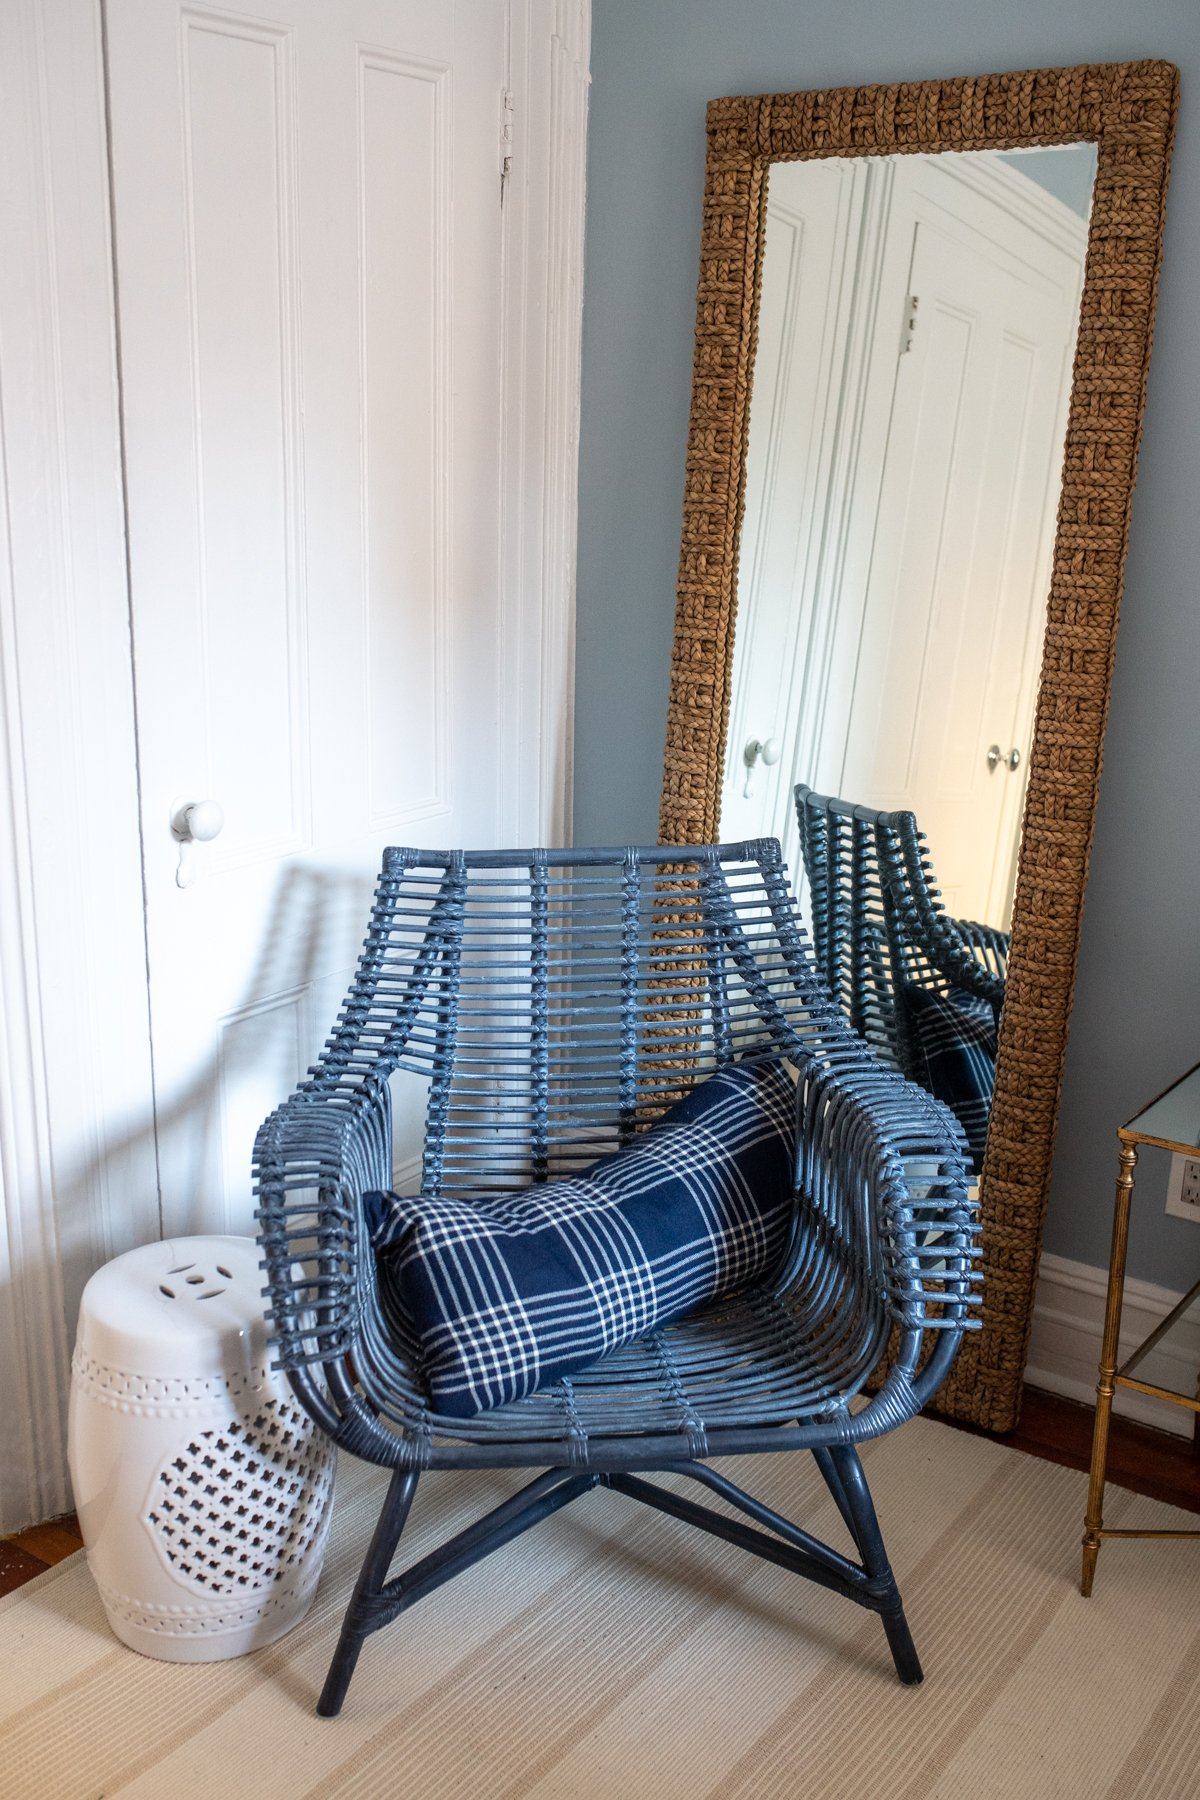 Stacie Flinner x Serena Lily Natural Seating-6.jpg